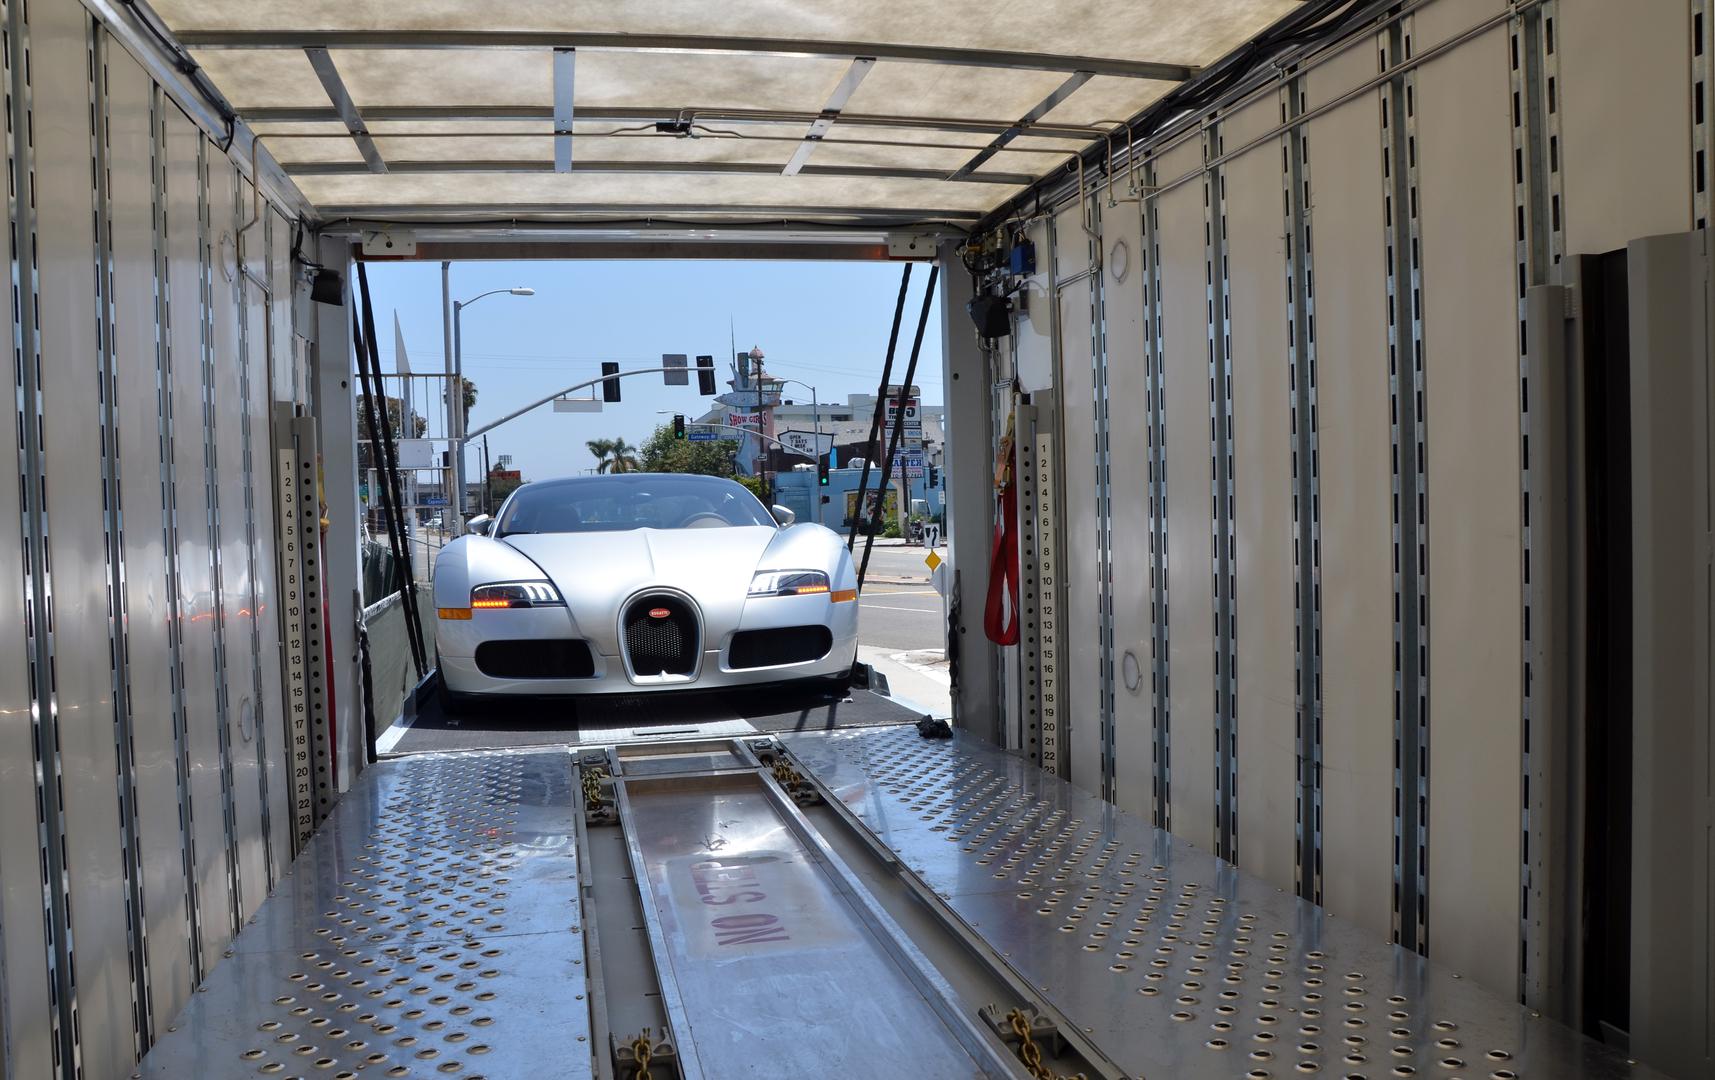 Auto Transport Quotes Delaware Auto Shipping  Car Transportation Estimates  Autotransquote